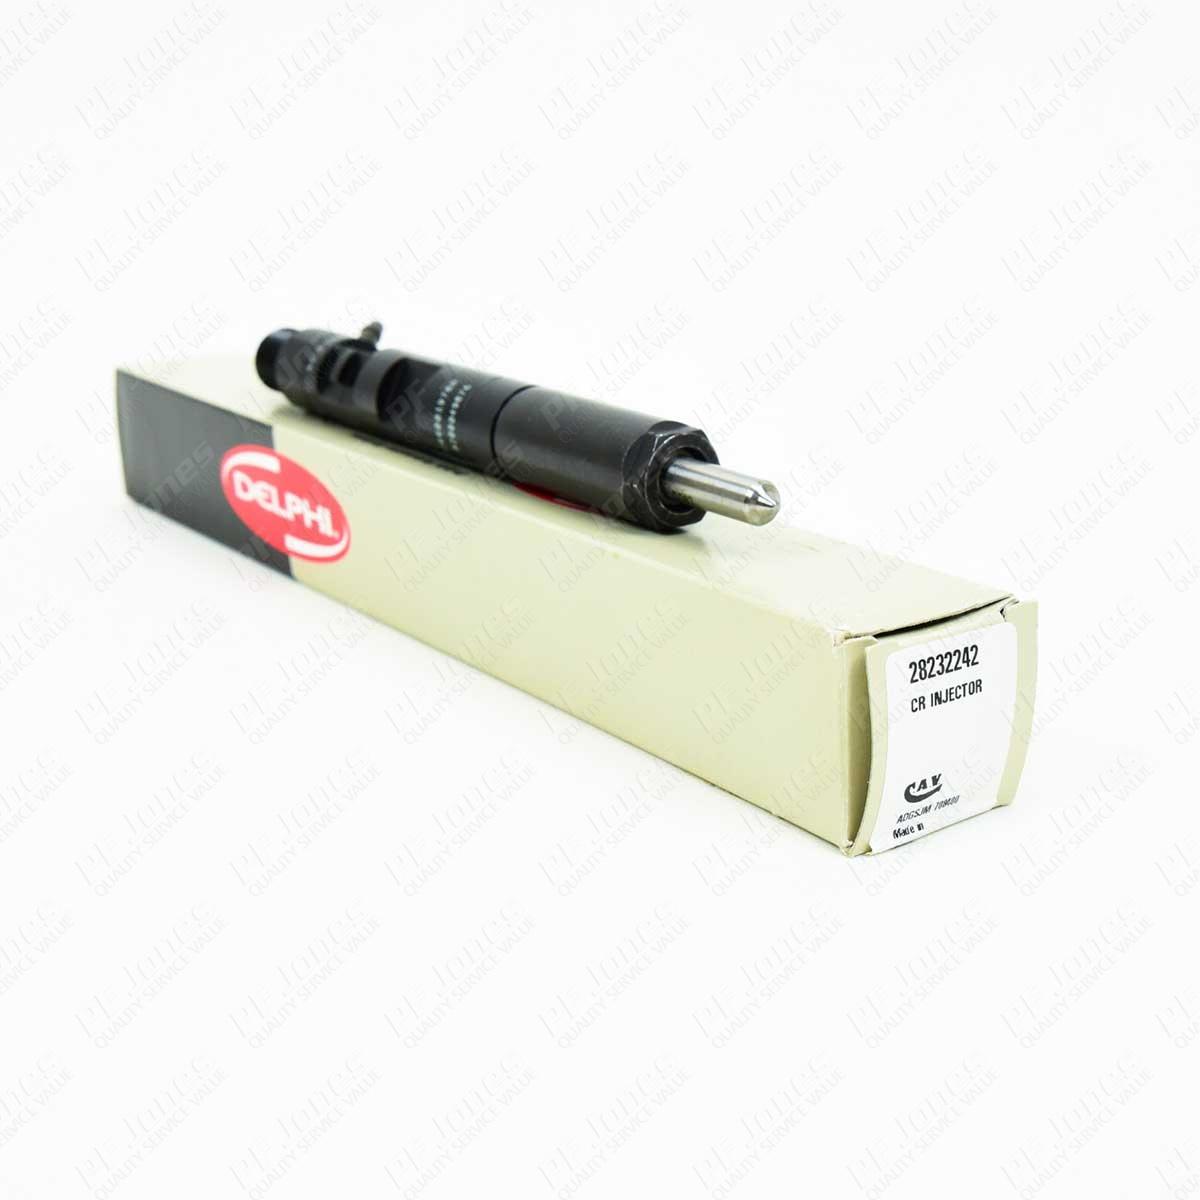 DELPHI Injector For RENAULT DACIA Duster Fluence Kangoo Grand Box 8200794299